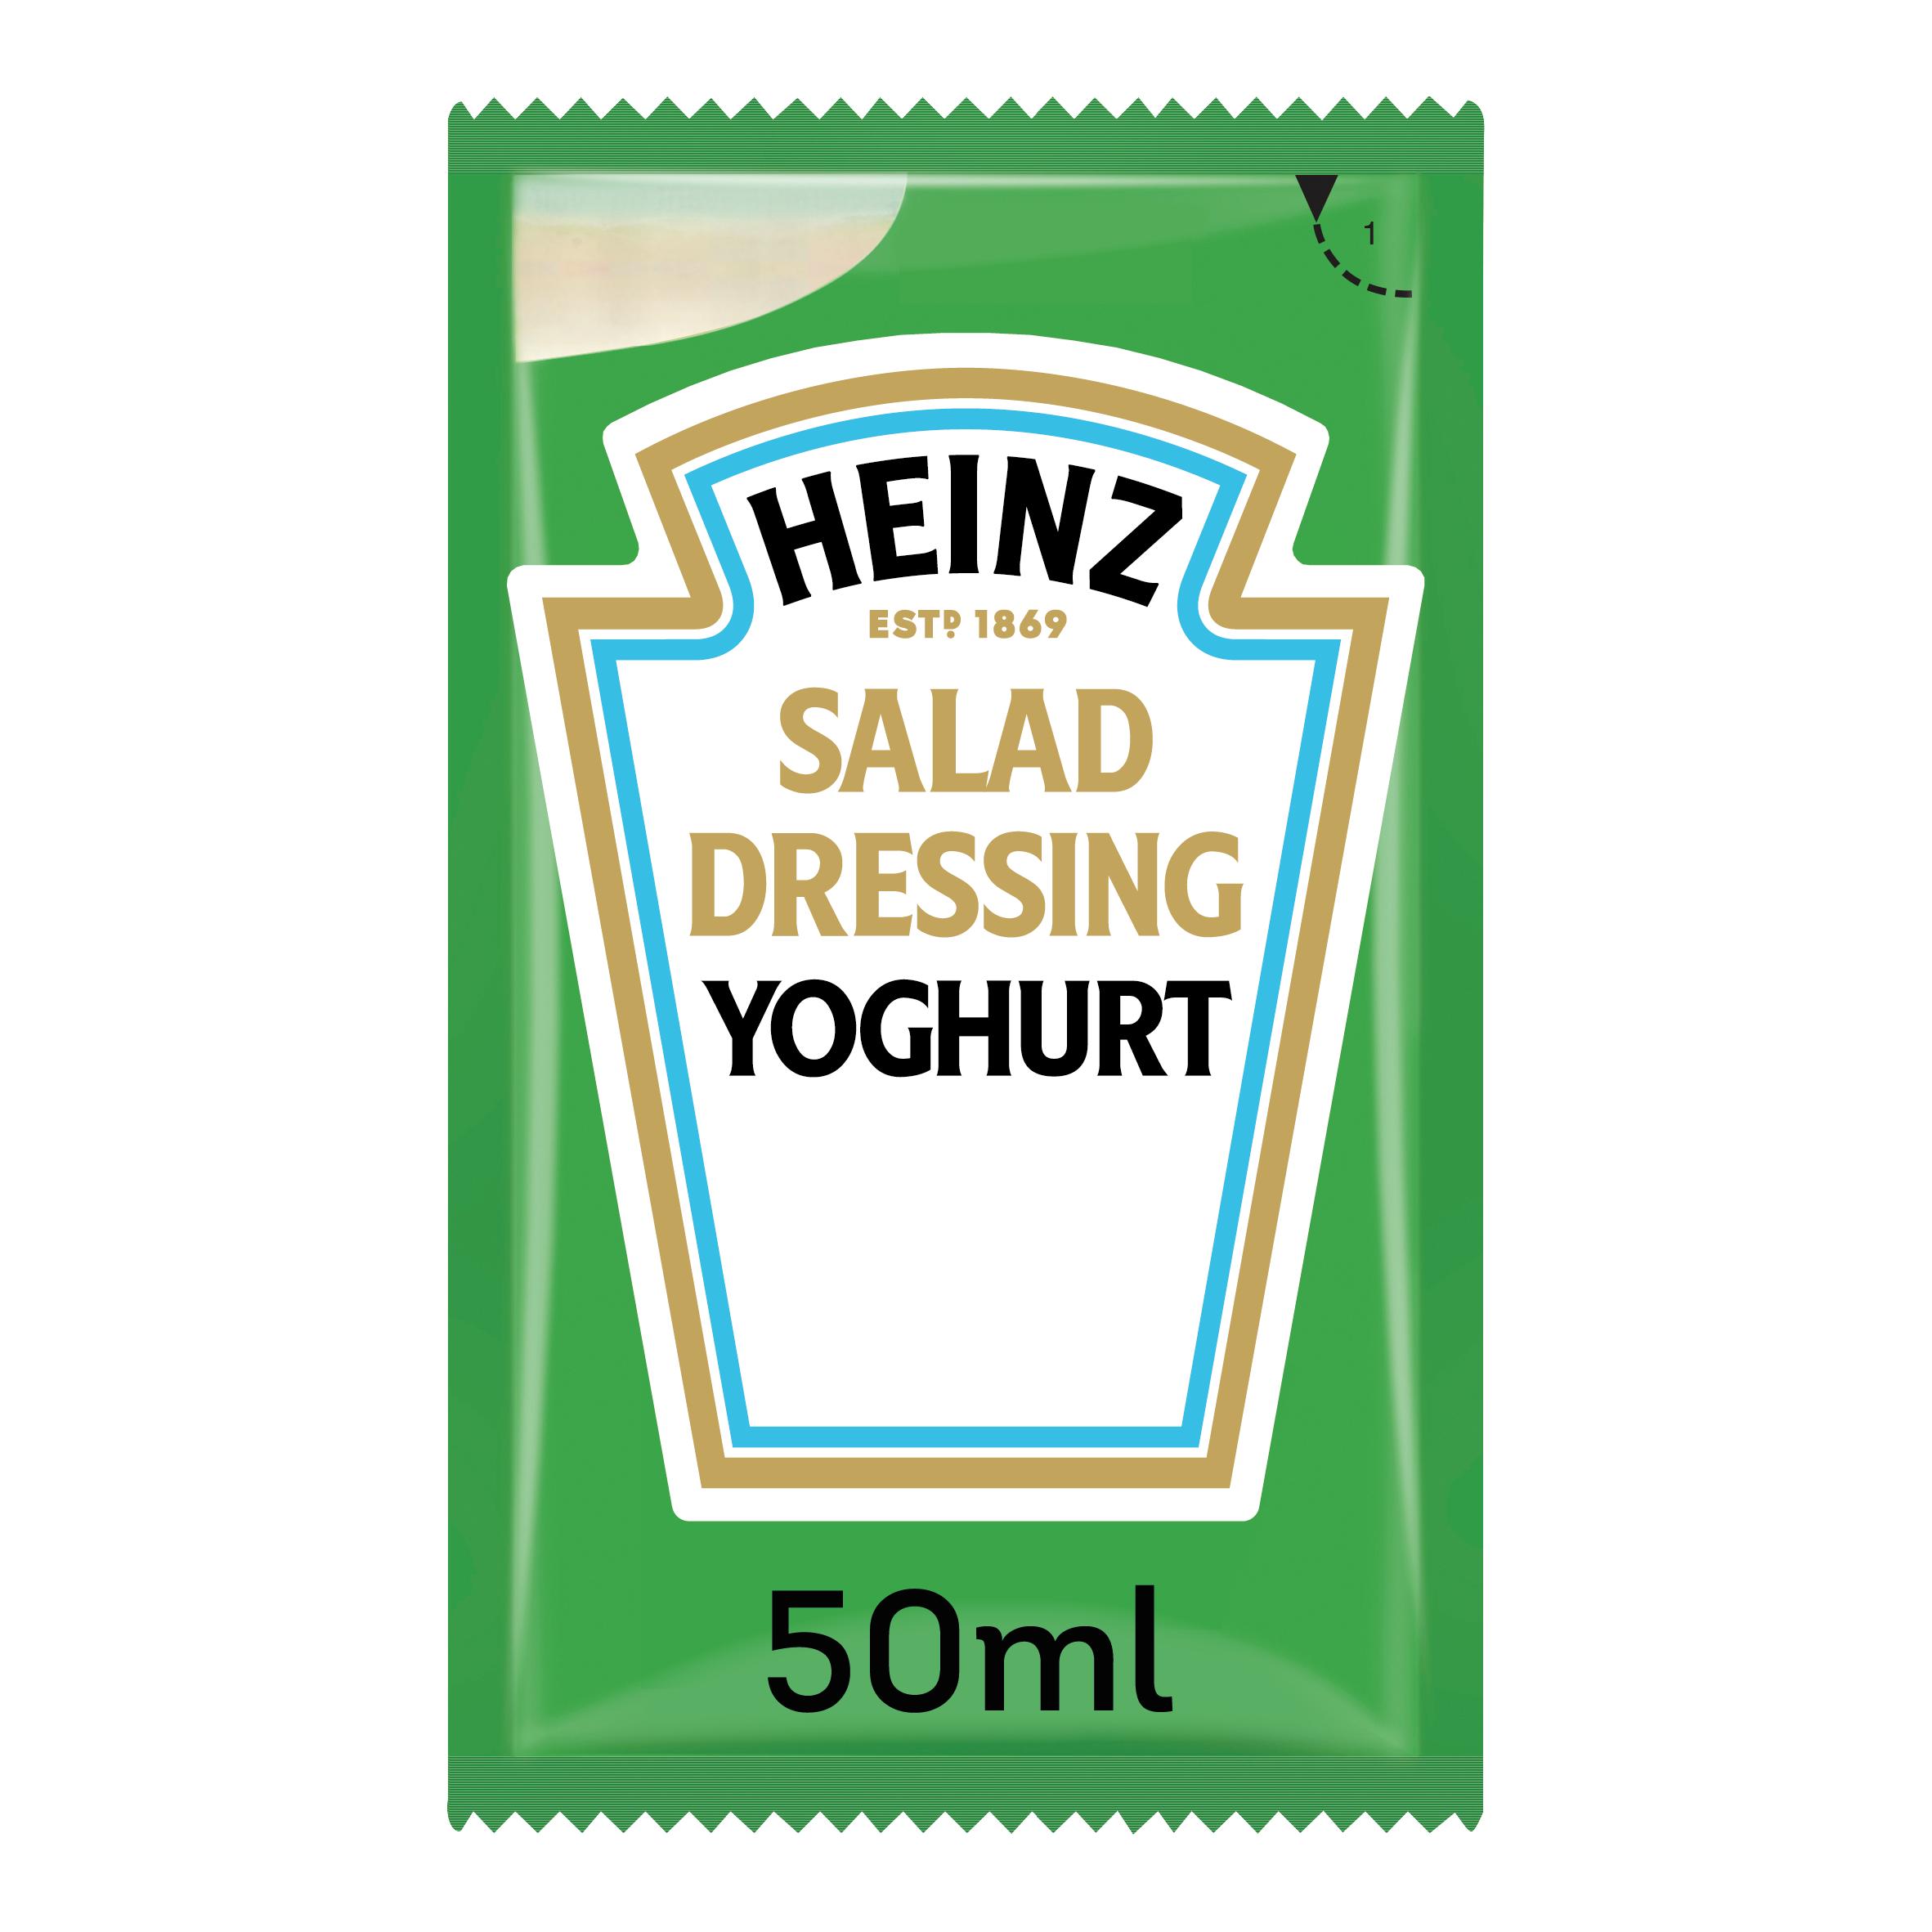 Heinz Yoghurt Dressing 50ml Bustina image